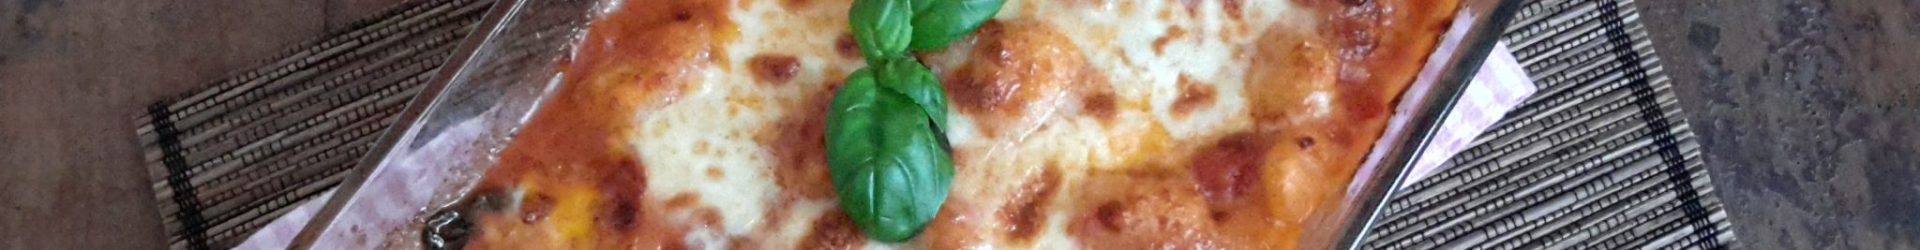 Gnocchi met tomatensaus en mozzarella uit de oven (gnocchi alla Sorrentina)